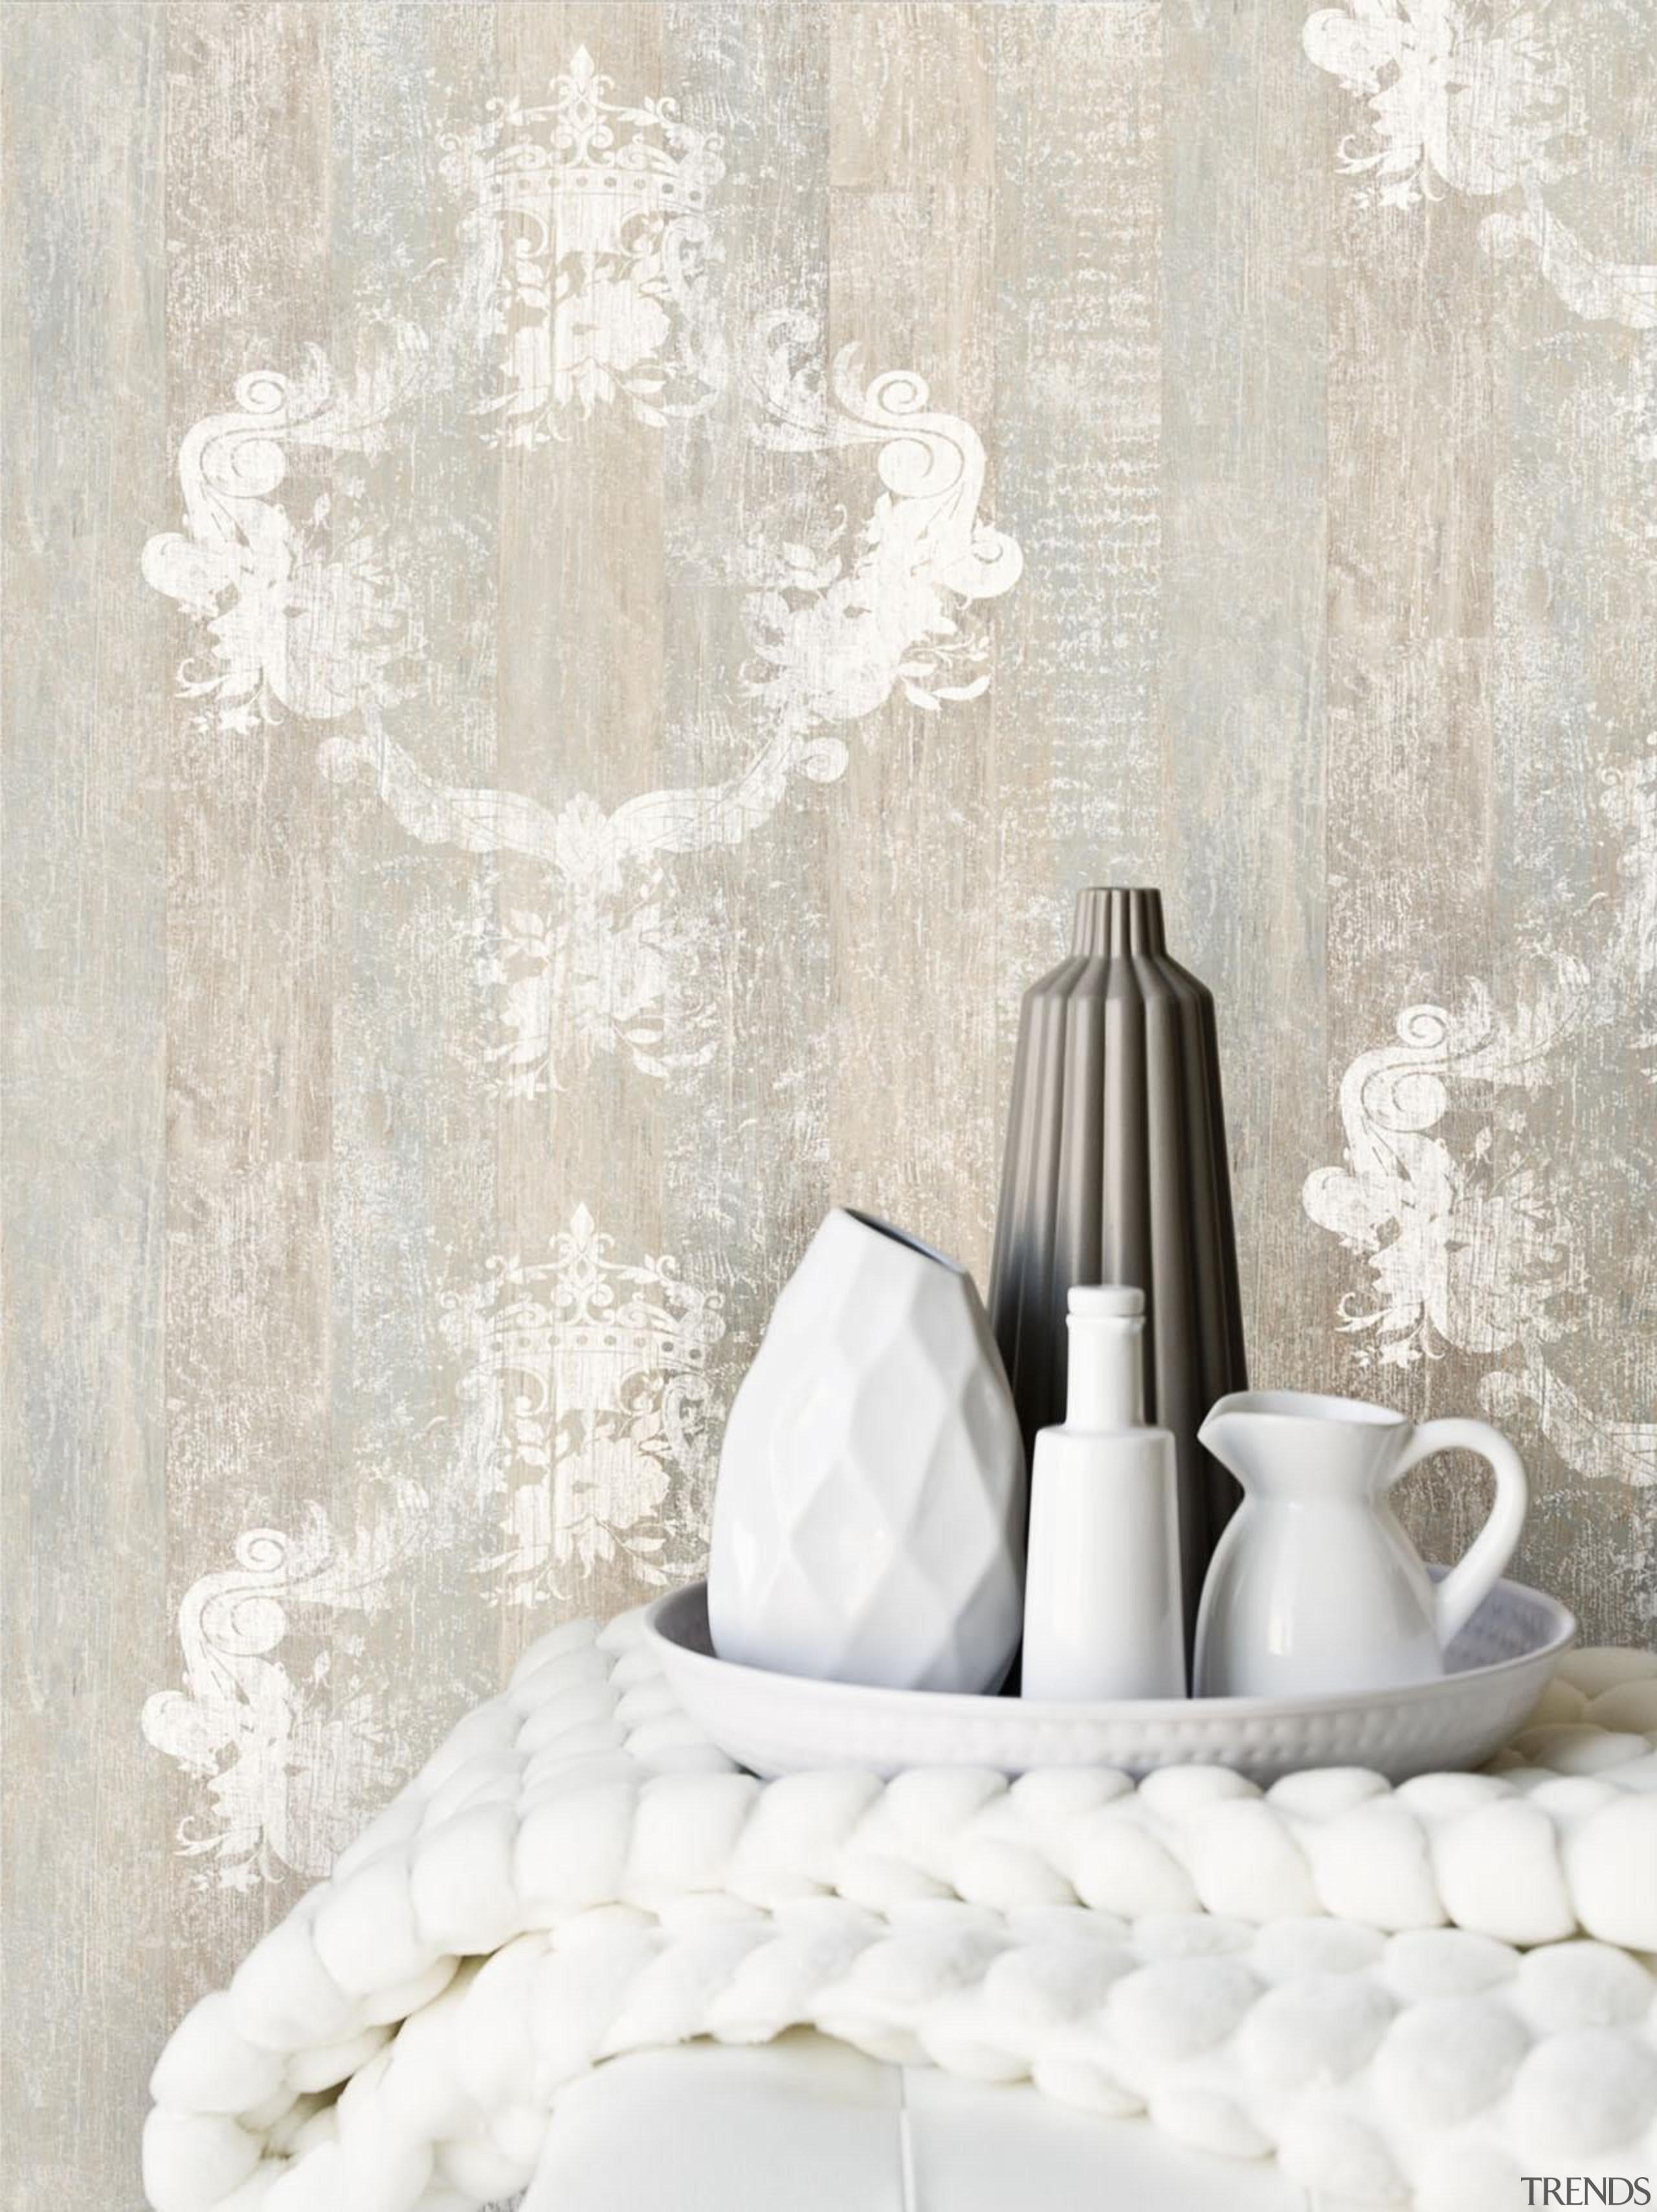 Elements Range - Elements Range - flooring | flooring, interior design, wall, wedding ceremony supply, white